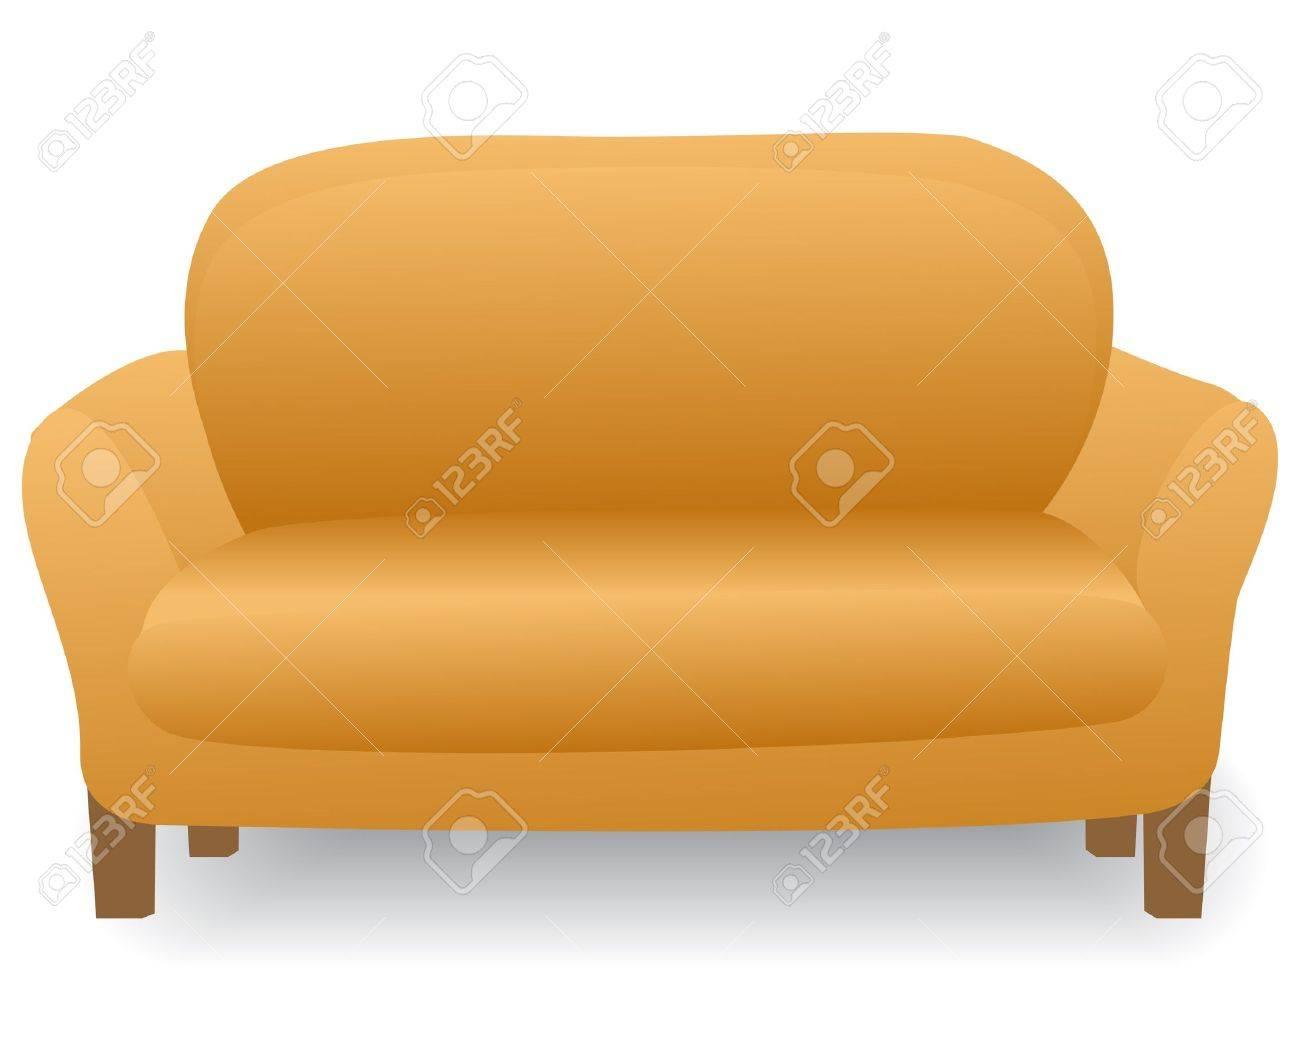 Illustration Soft And Comfortable Home Modern Sofa Stock Vector   10488351